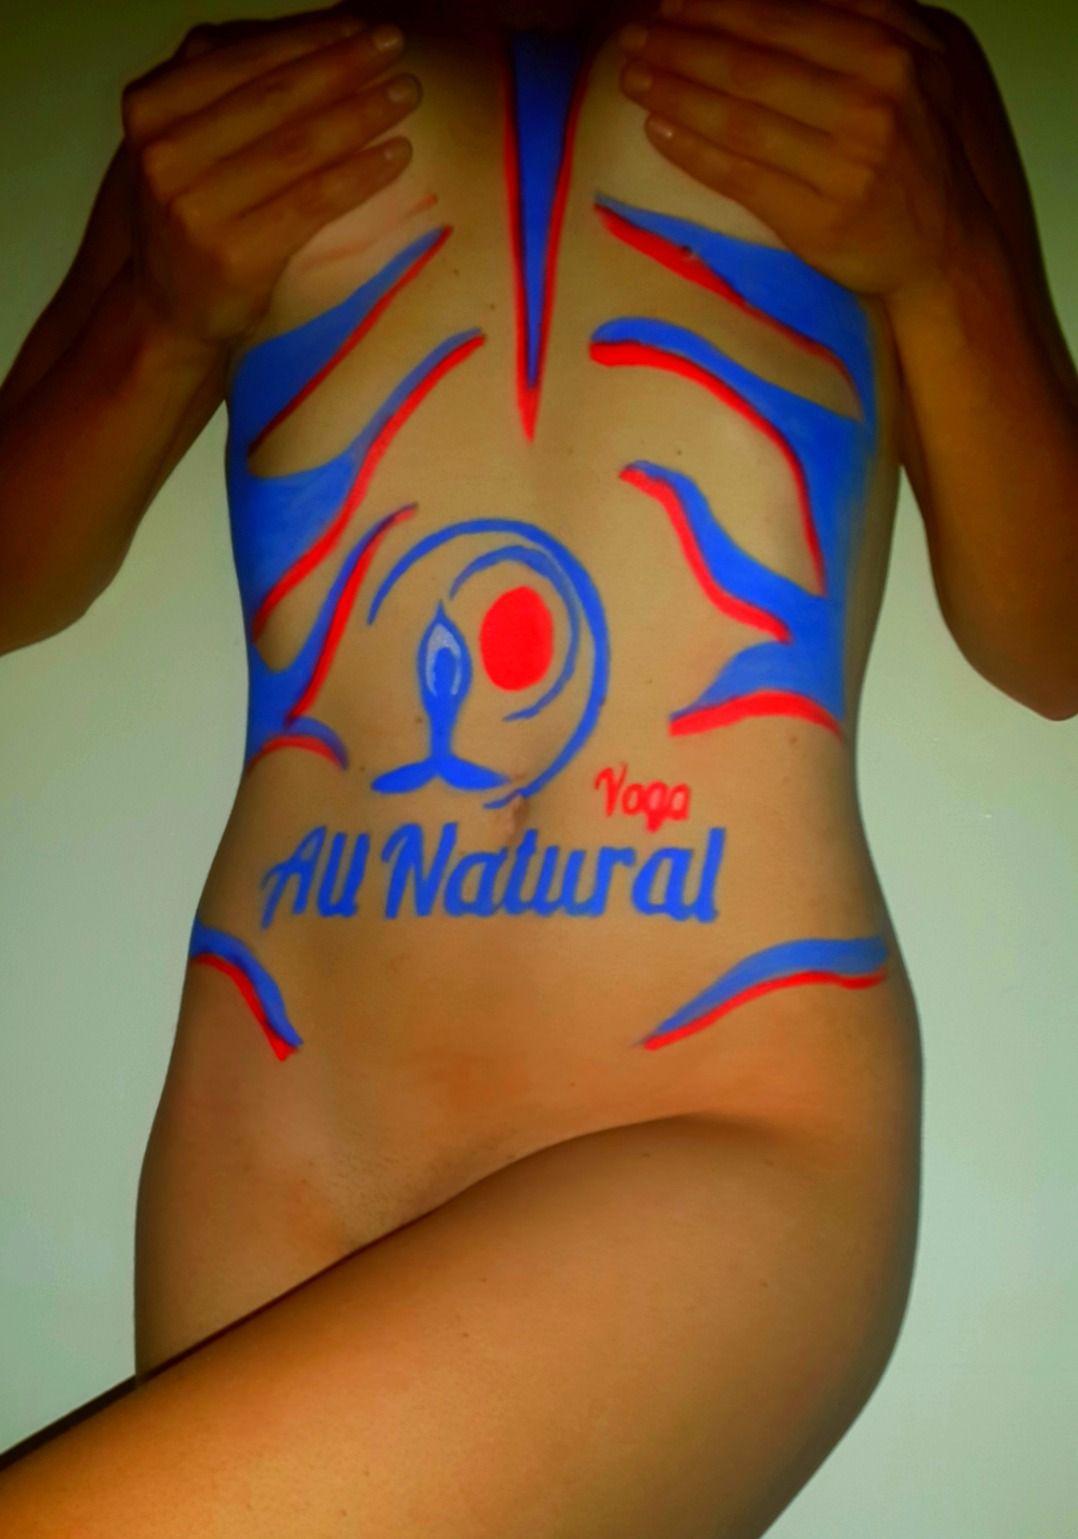 Online nude community